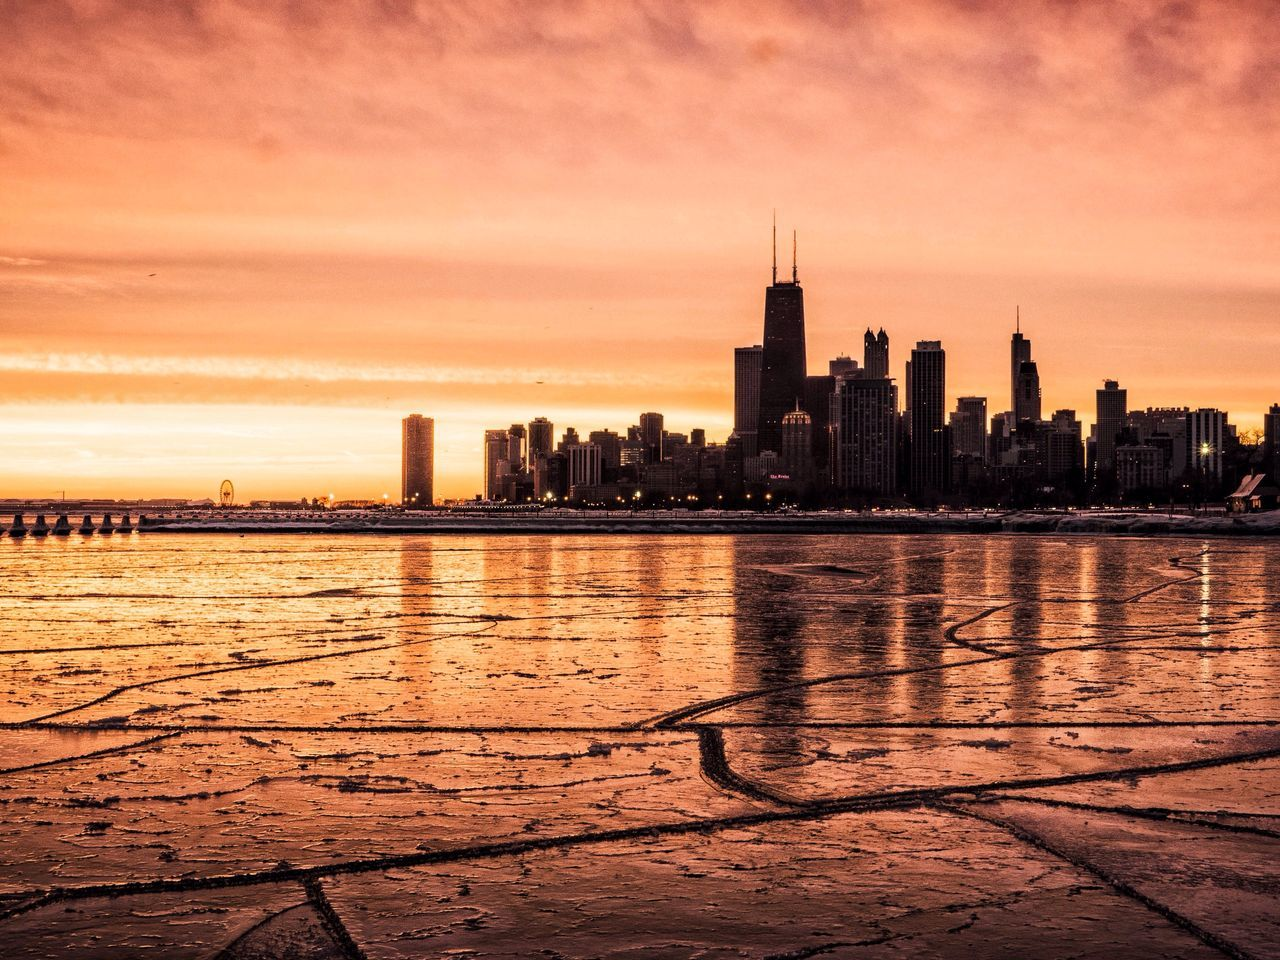 Finding New Frontiers Architecture City Sky Skyline Beach EyeEm Best Shots Frozen Cracks Mars Chicago Chicago Skyline Ice Weather Cityscape Urban Skyline Light Colors